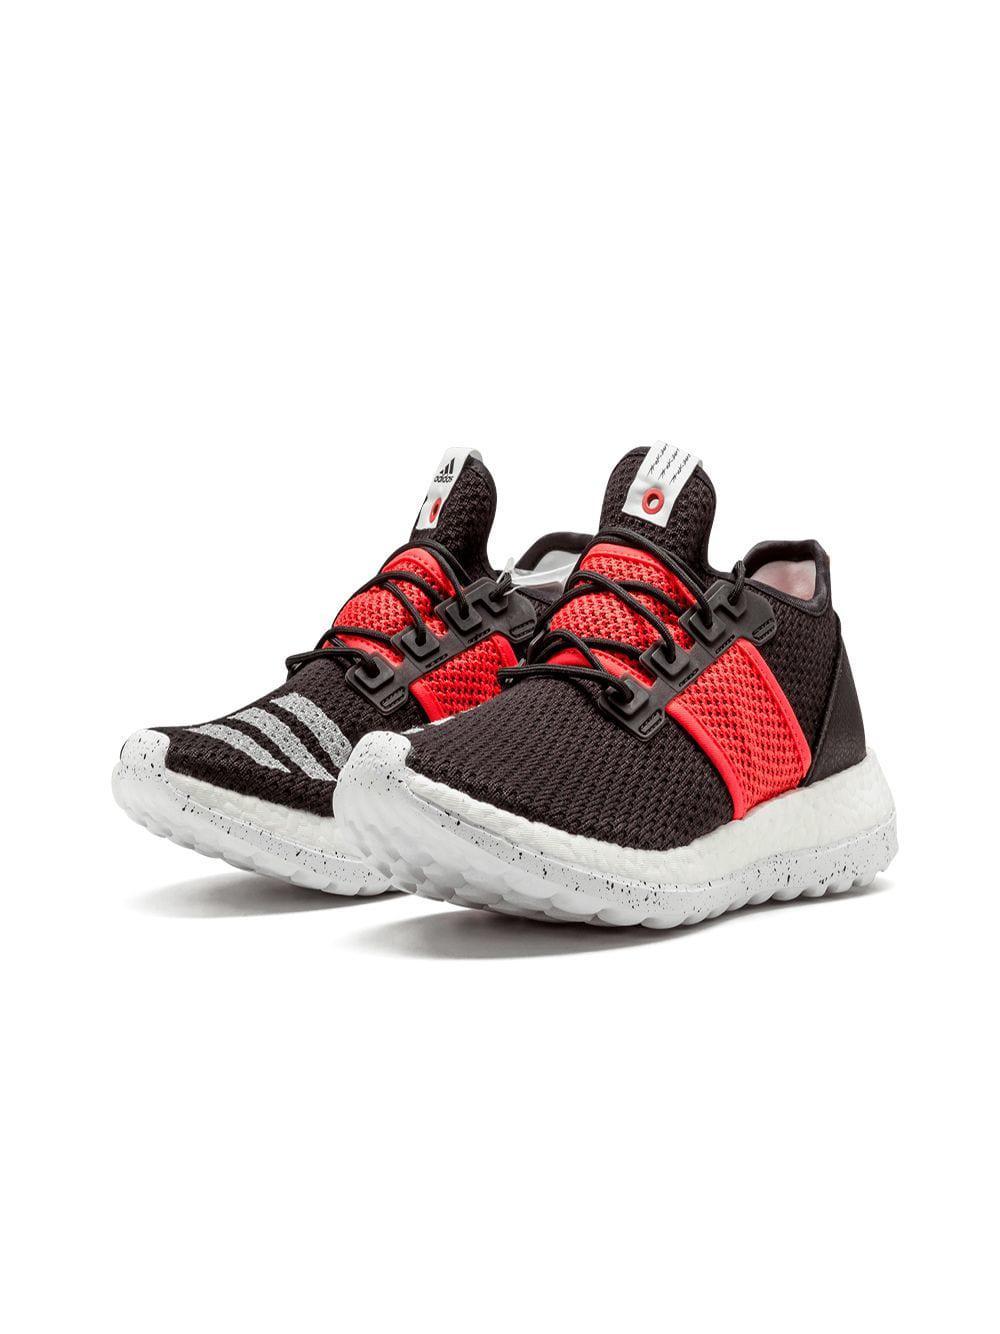 758d90d94e276 Adidas Pure Boost Zg Primeknit Li Sneakers in Black for Men - Lyst